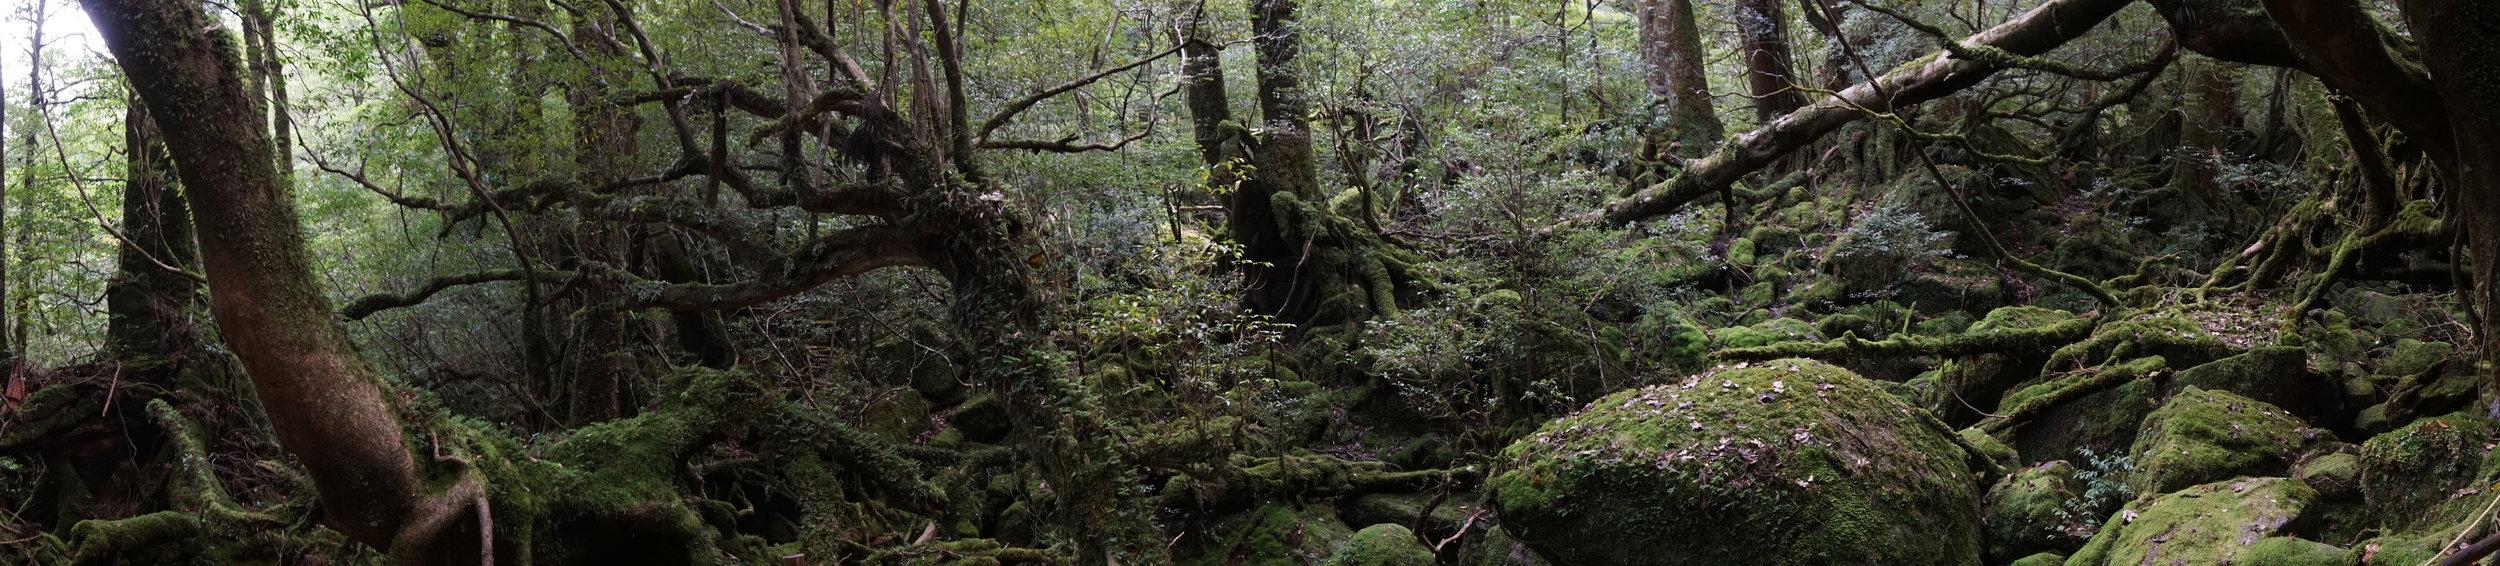 moss_forest_yakushima